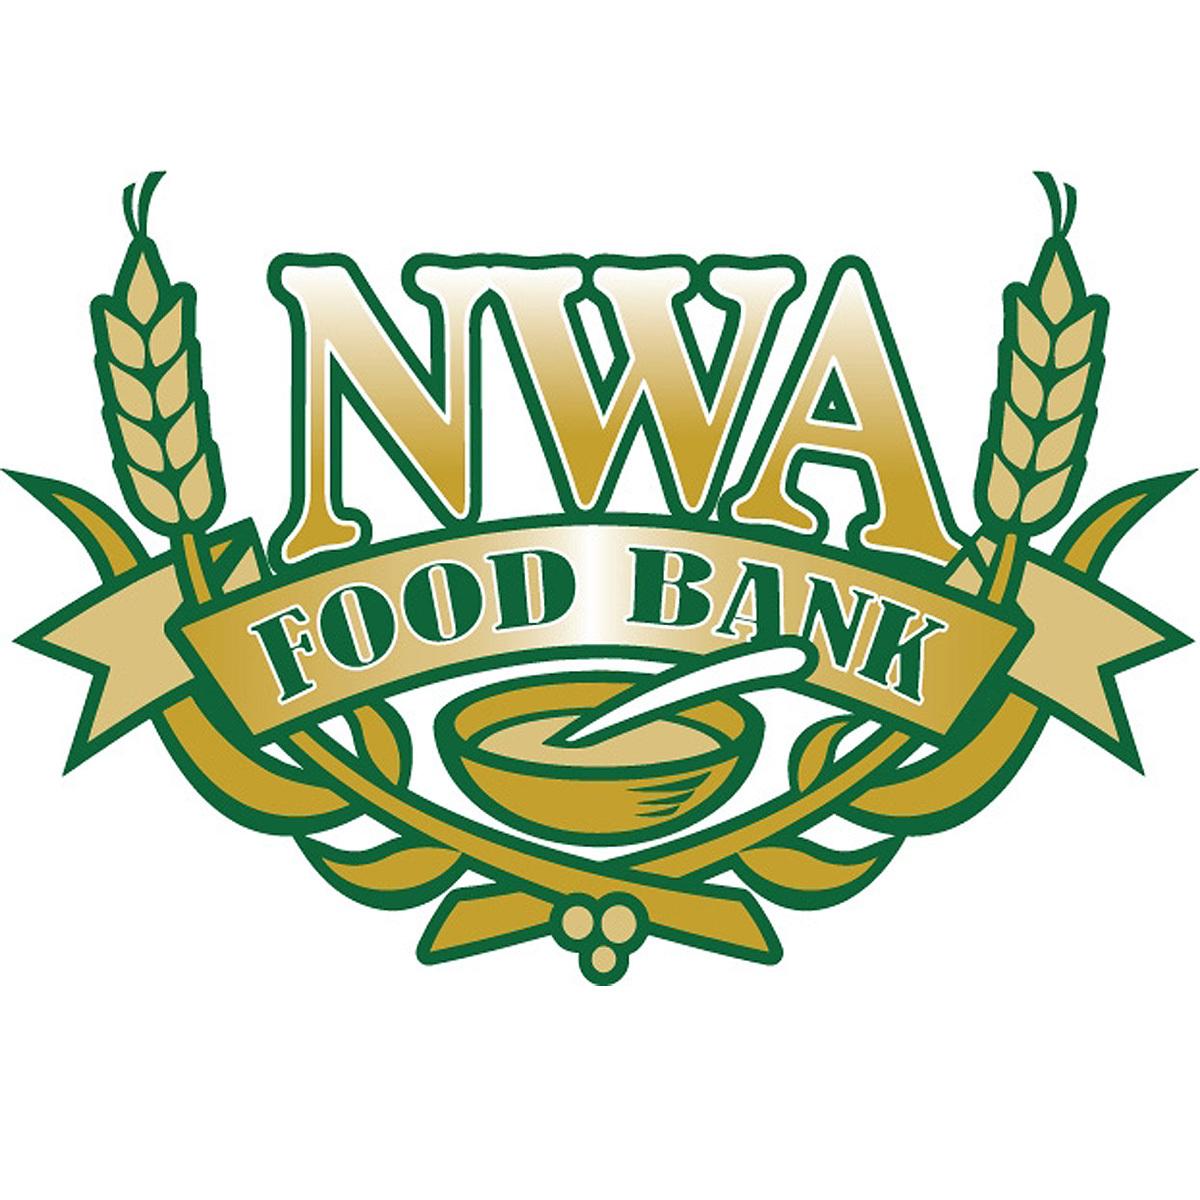 The Northwest Arkansas Food Bank